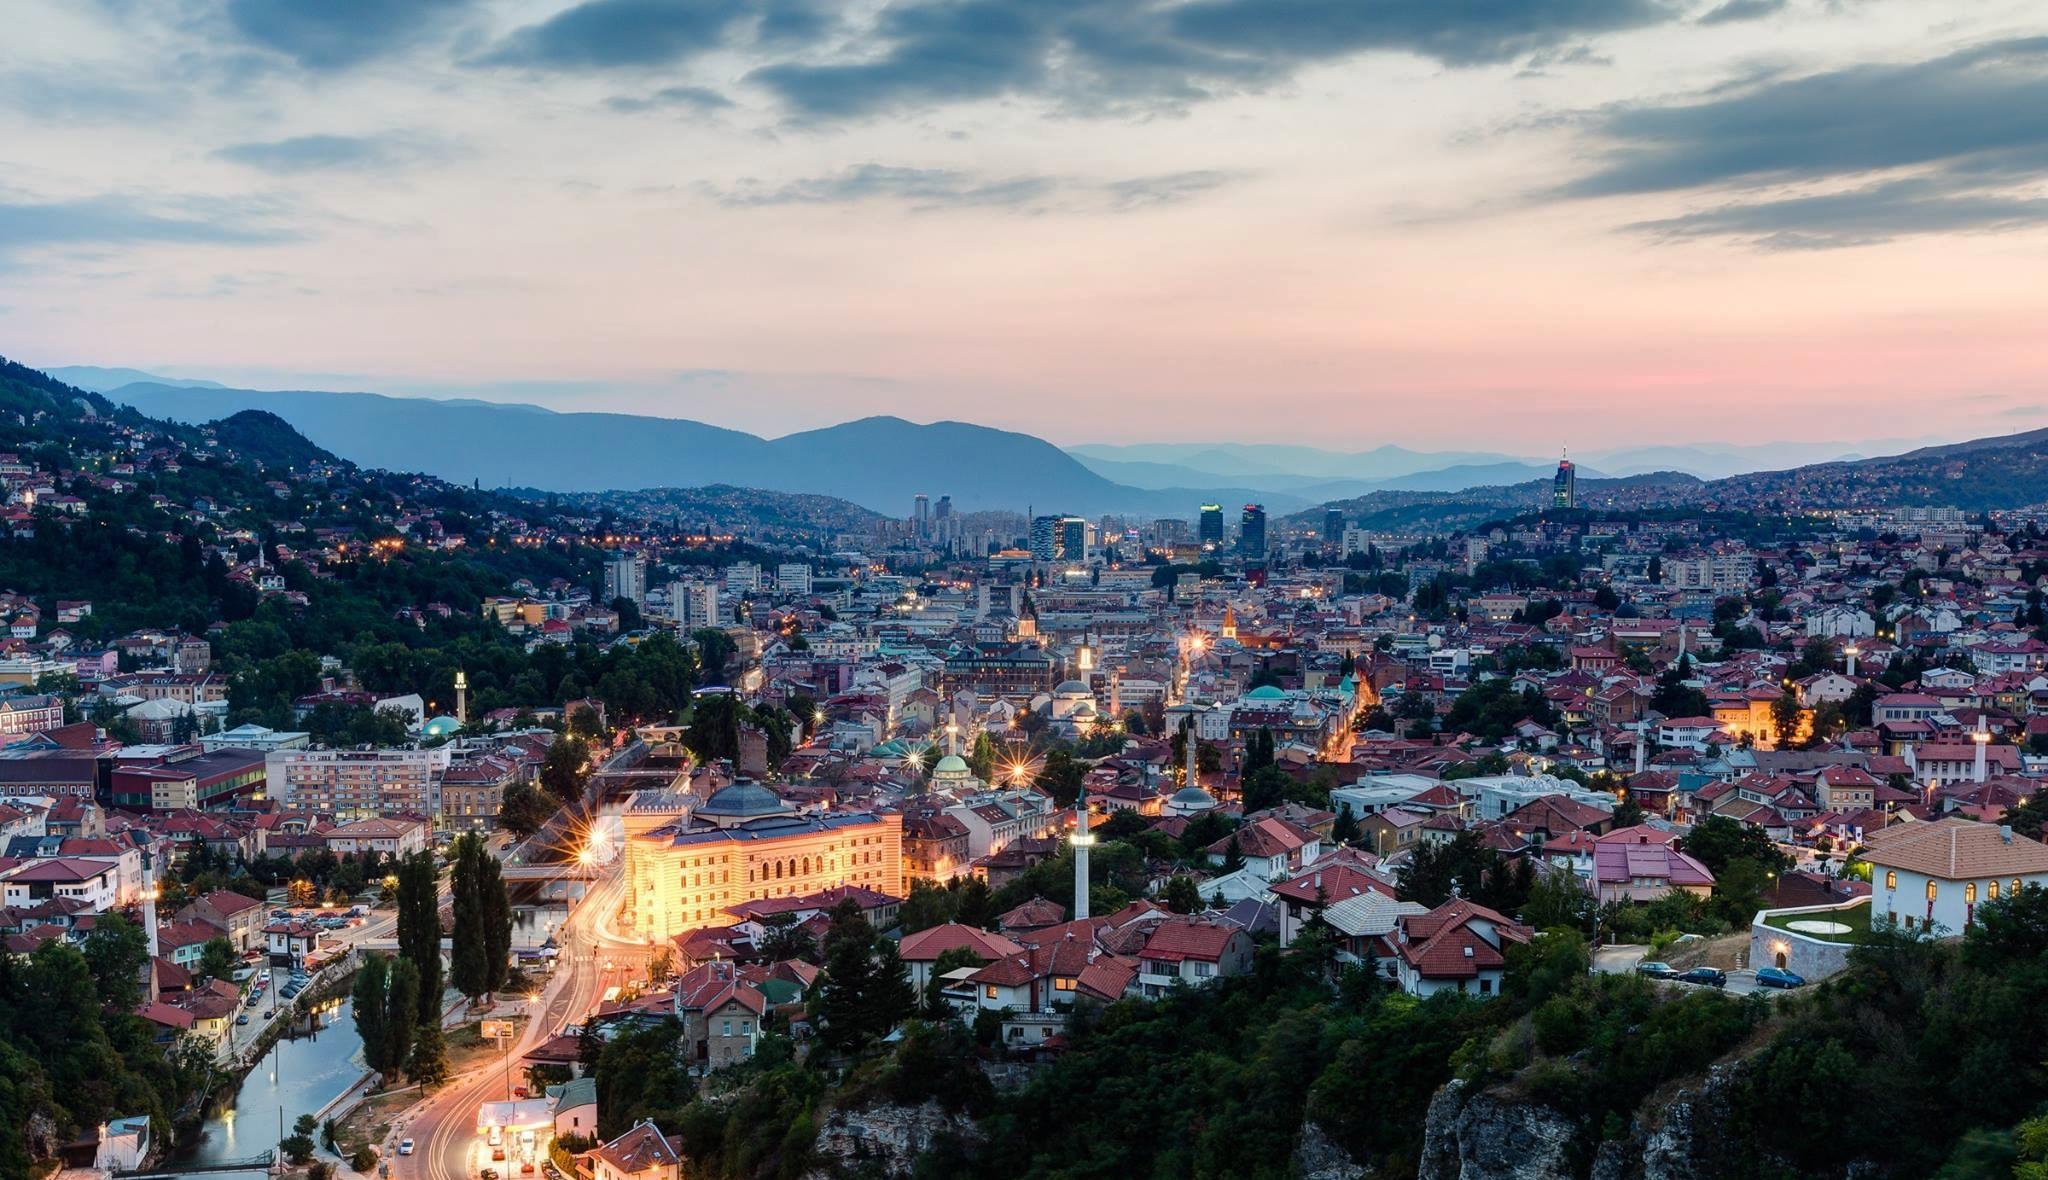 Sarajevo, Bosnia and Herzegovina - Year round Bosnia & Montenegro discovery 8 days tour from Korcula. Monterrasol Travel small group tour in minivan.